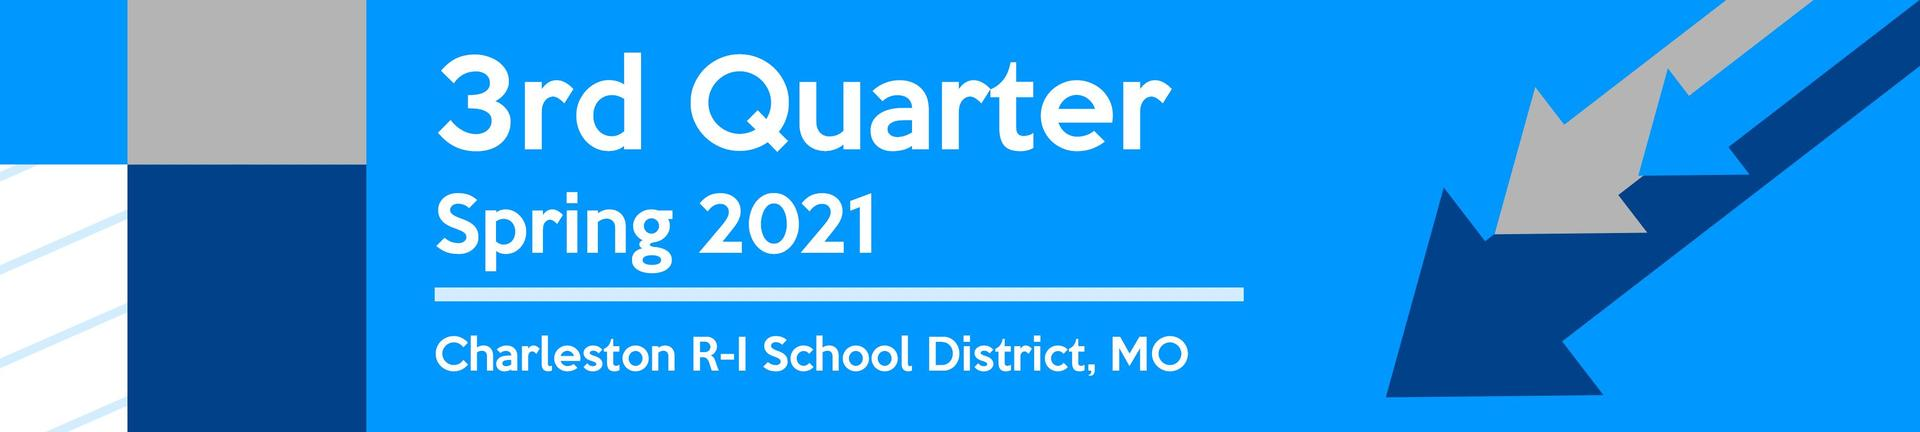 3rd Quarter Spring 2021 - Charleston R-I School District, MO